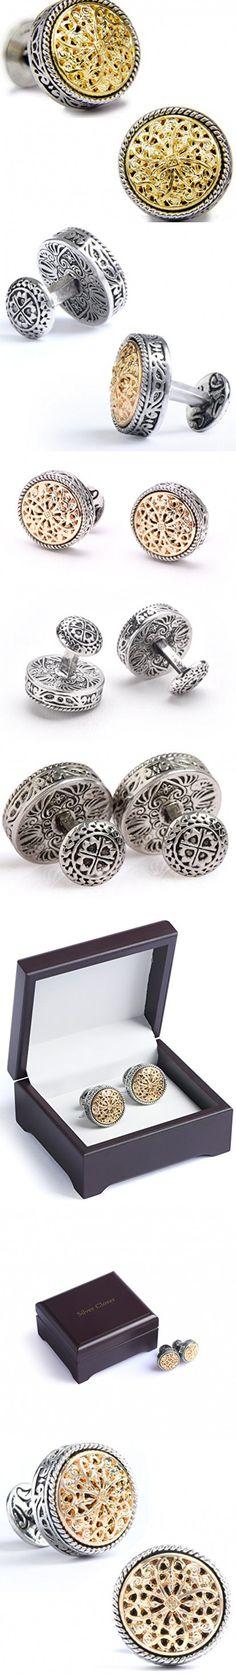 Men's Vintage Silver & 18K Gold Celtic Cross Filigree Floral Cufflinks, for Wedding, Bussiness, Gift Box Included